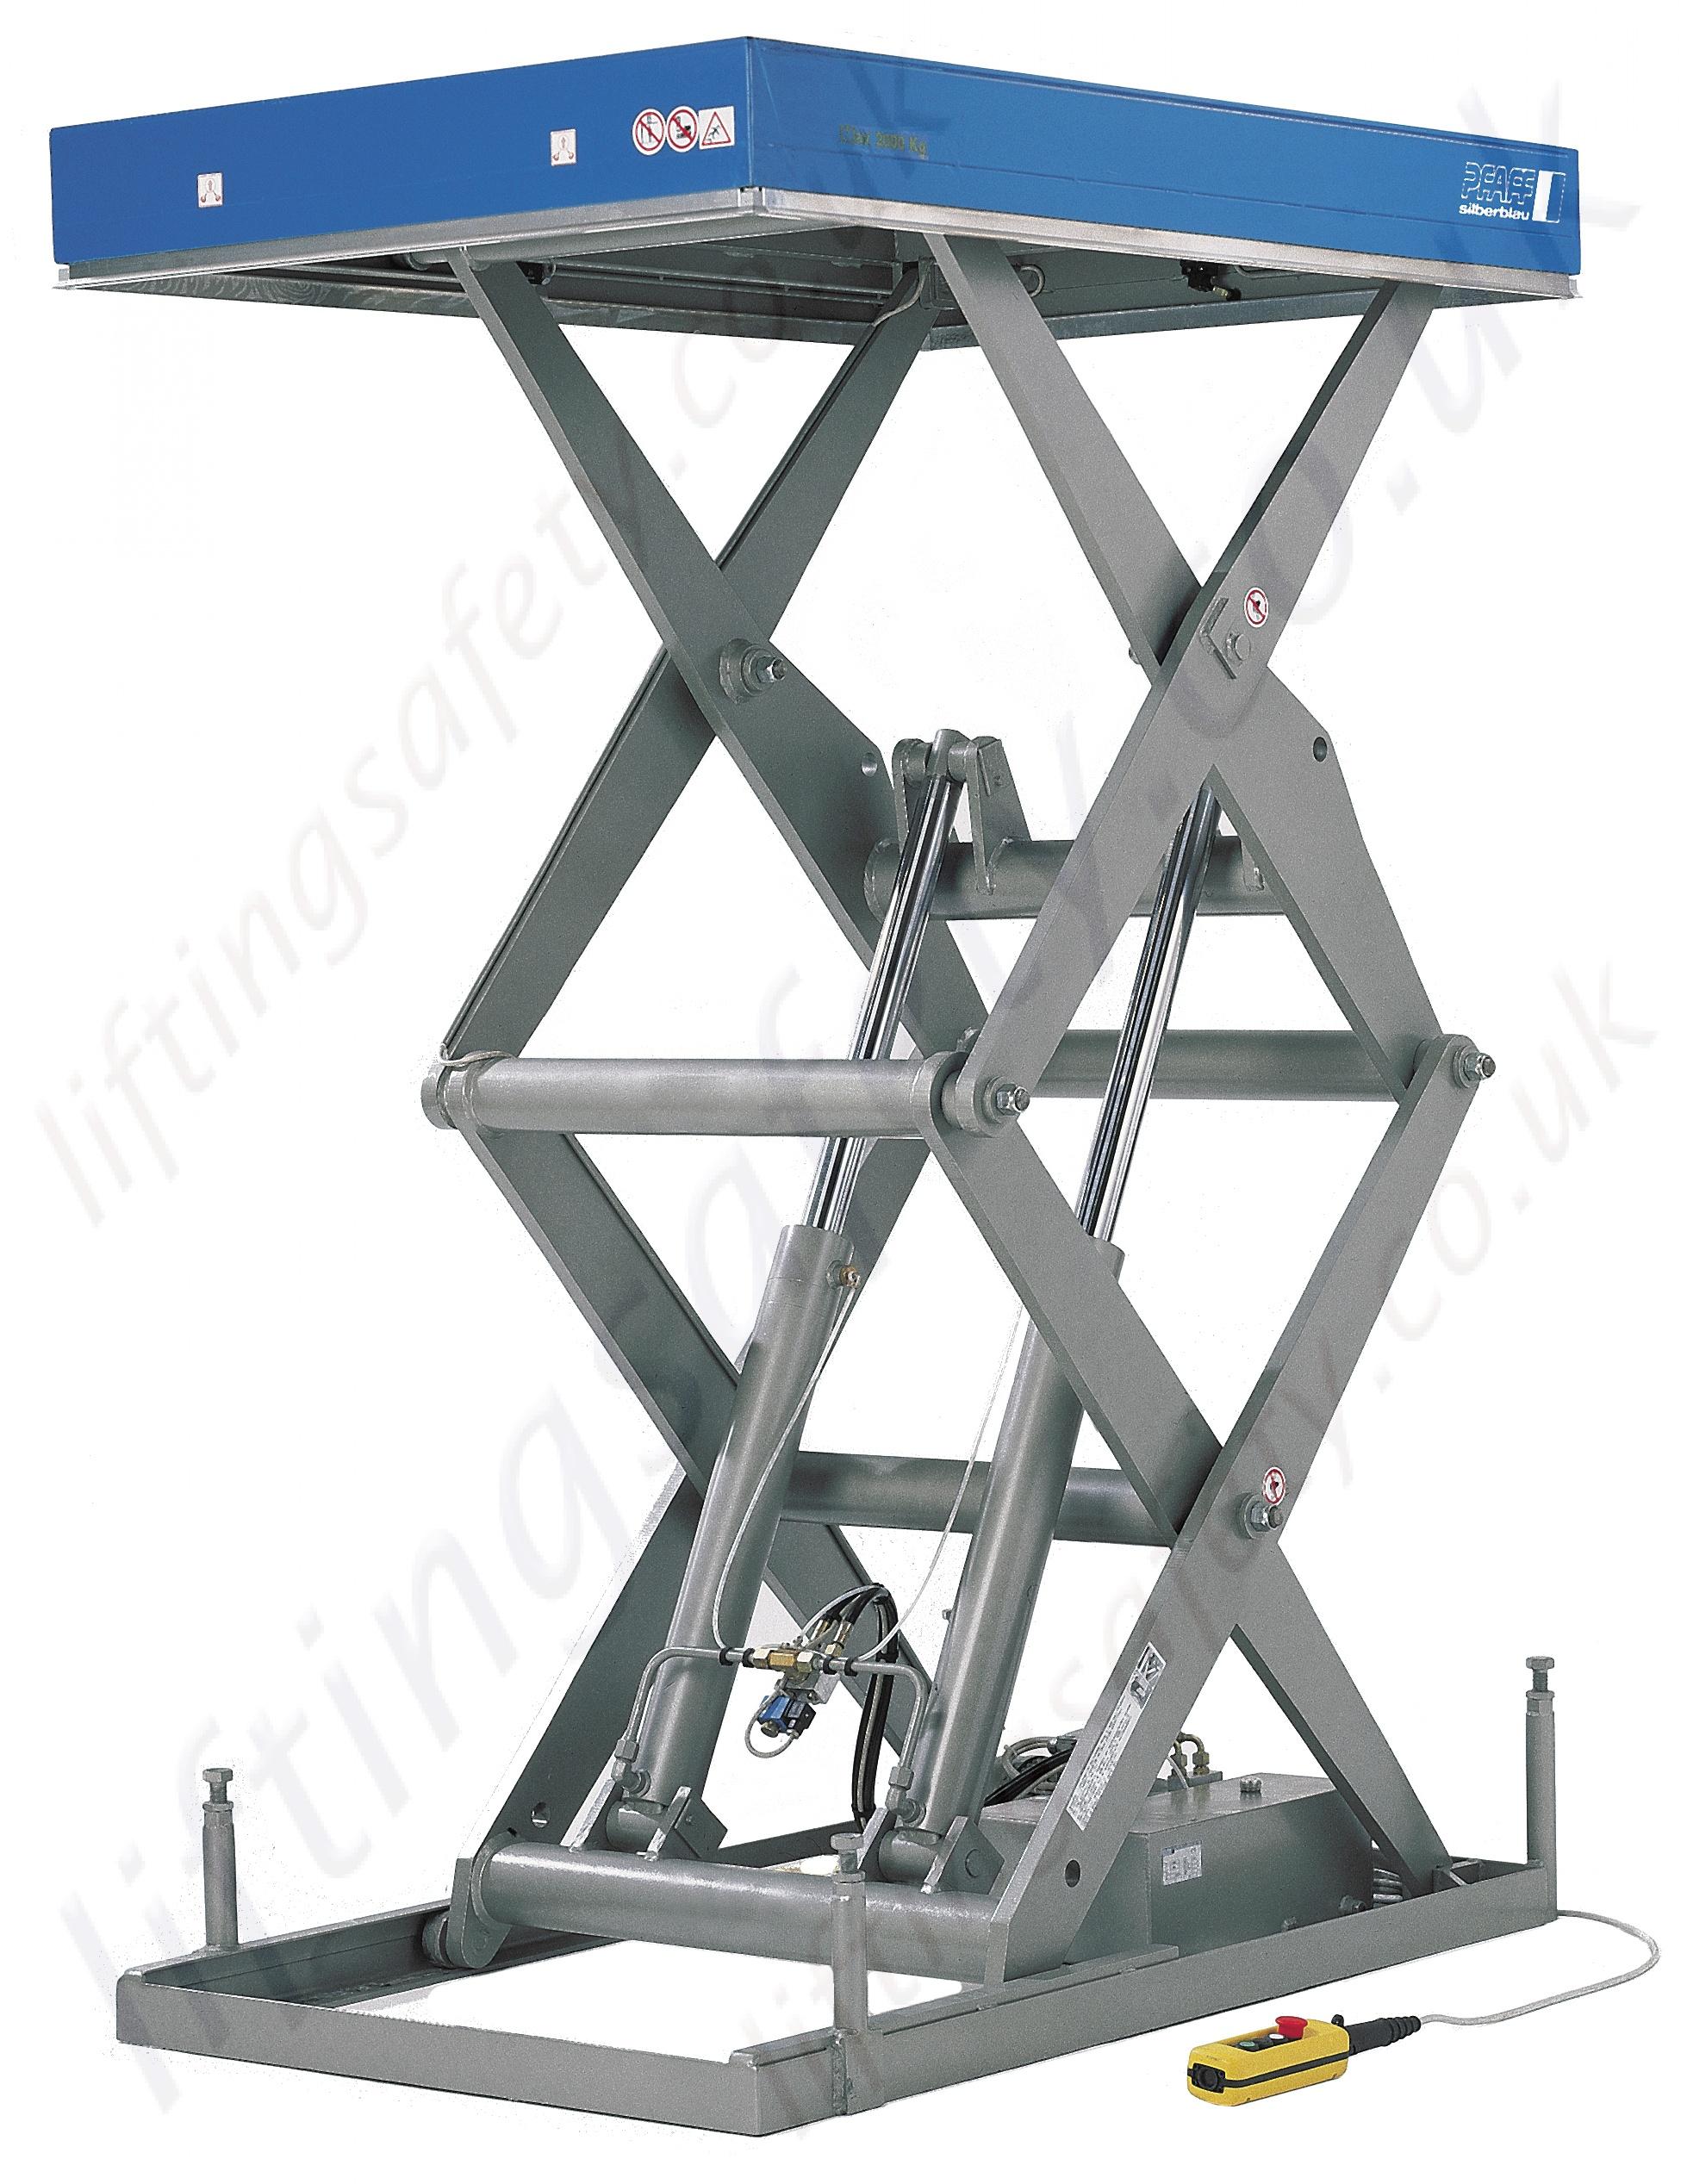 Pfaff Static Hta D Electric Lift Table 1000kg To 3000kg Lifting Capacities 1500mm 1800mm